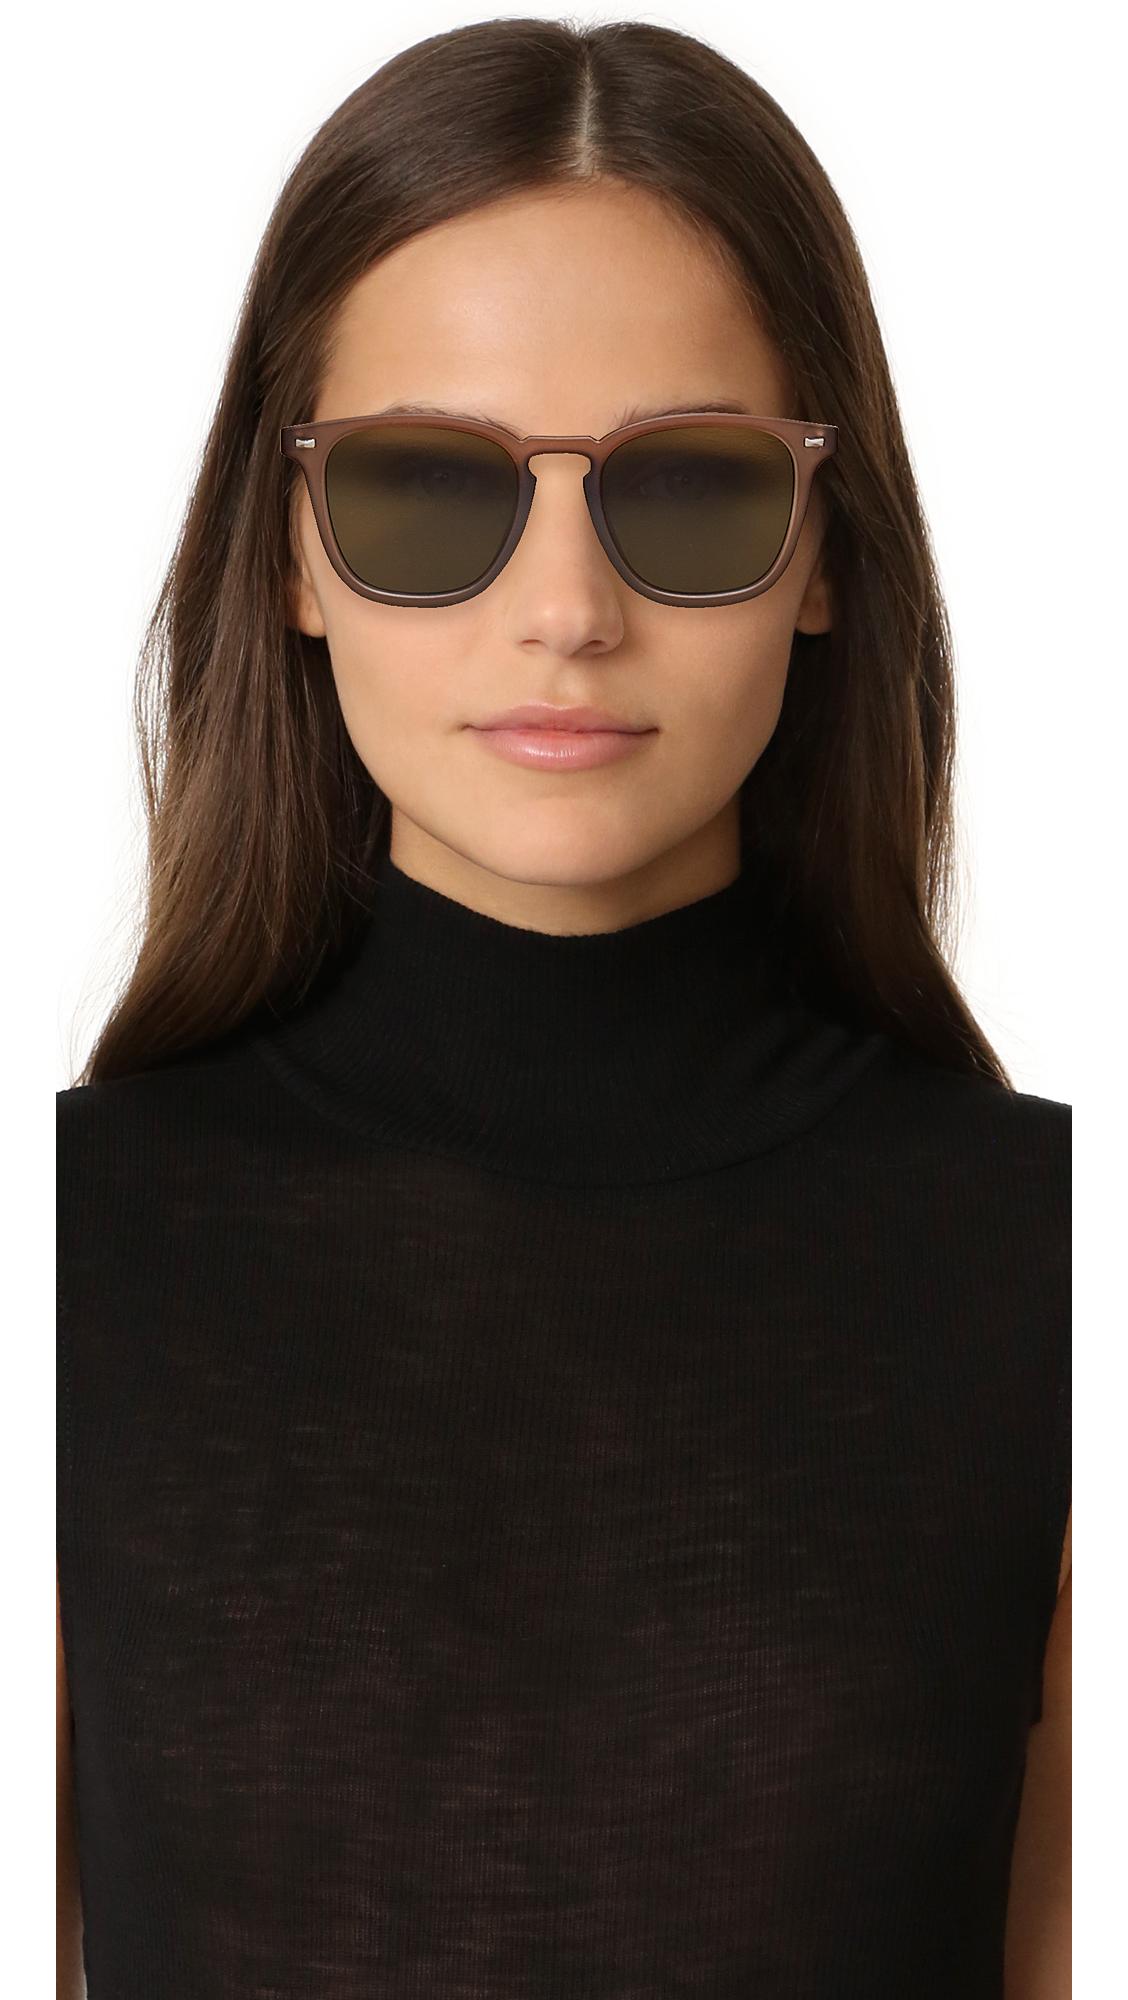 Le Specs Sonnenbrille NO BIGGIE ZxfEYy1nht